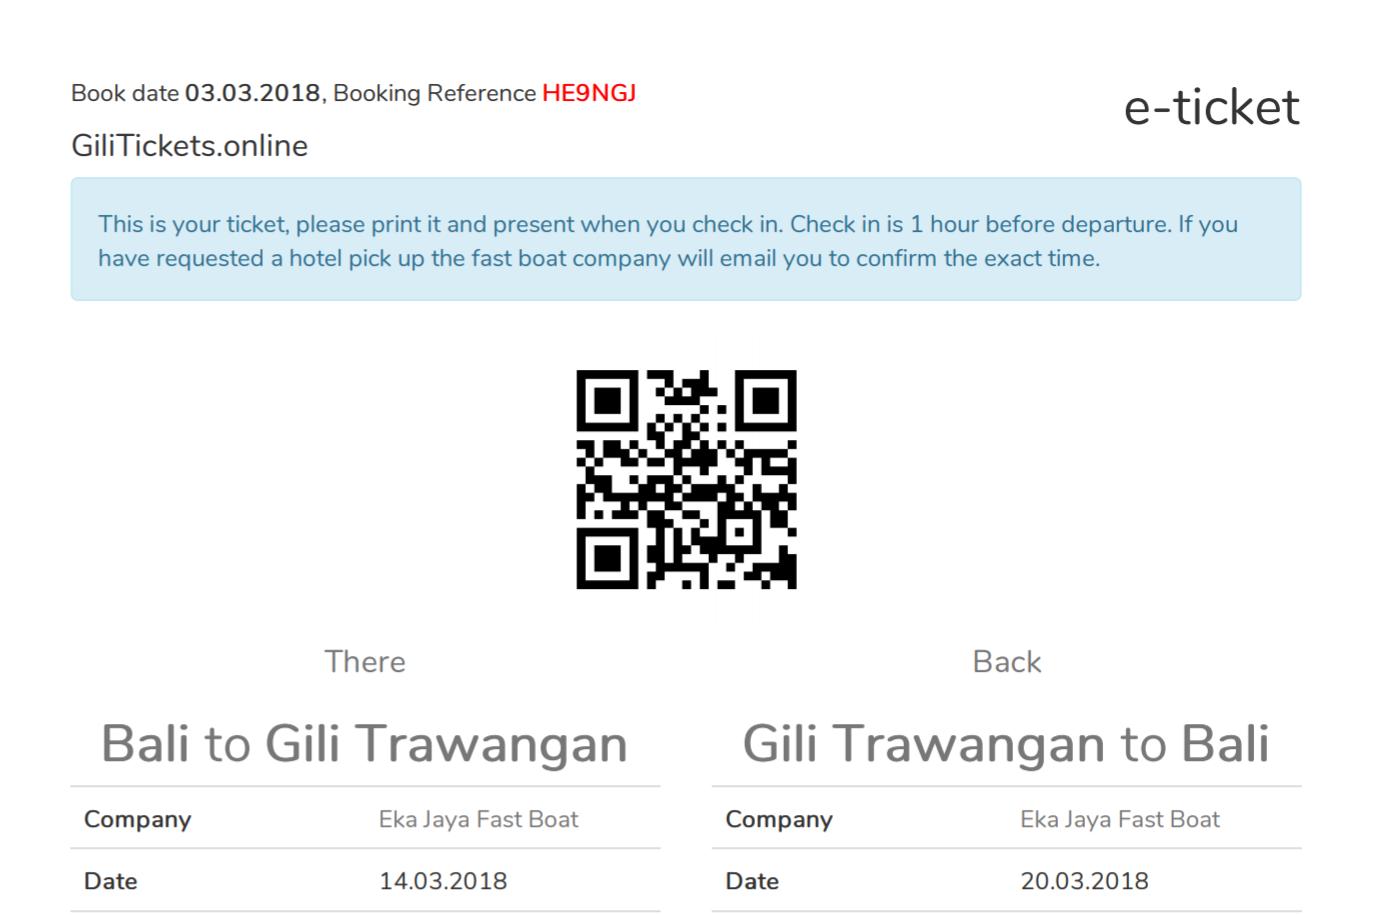 Sample ticket from Bali to Gili Trawangan